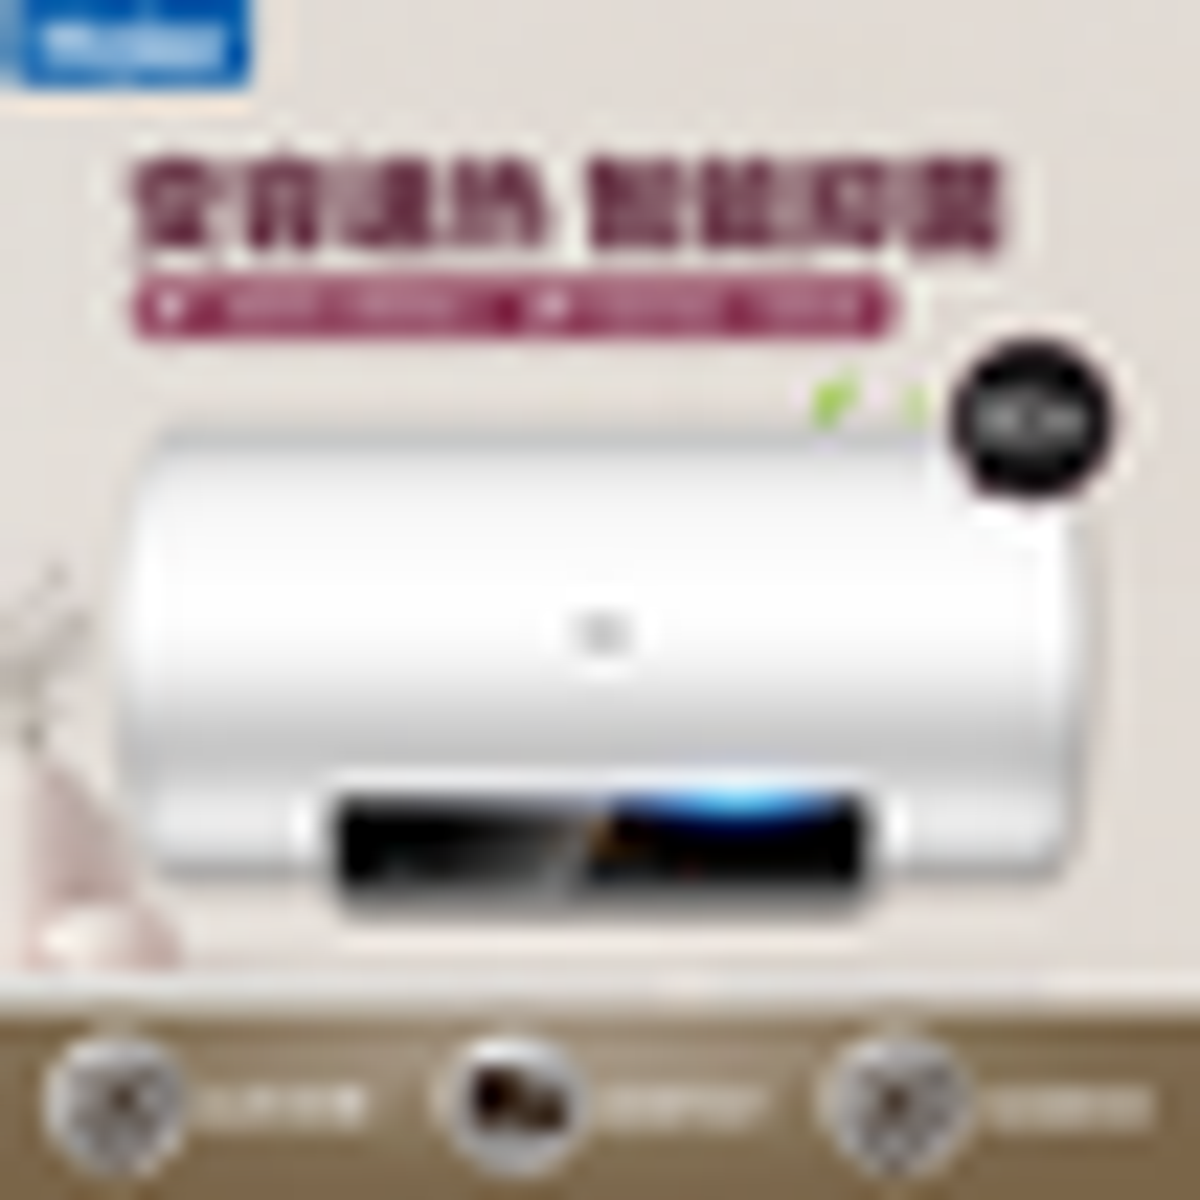 Haier/海尔 电热水器 EC8002-MC5